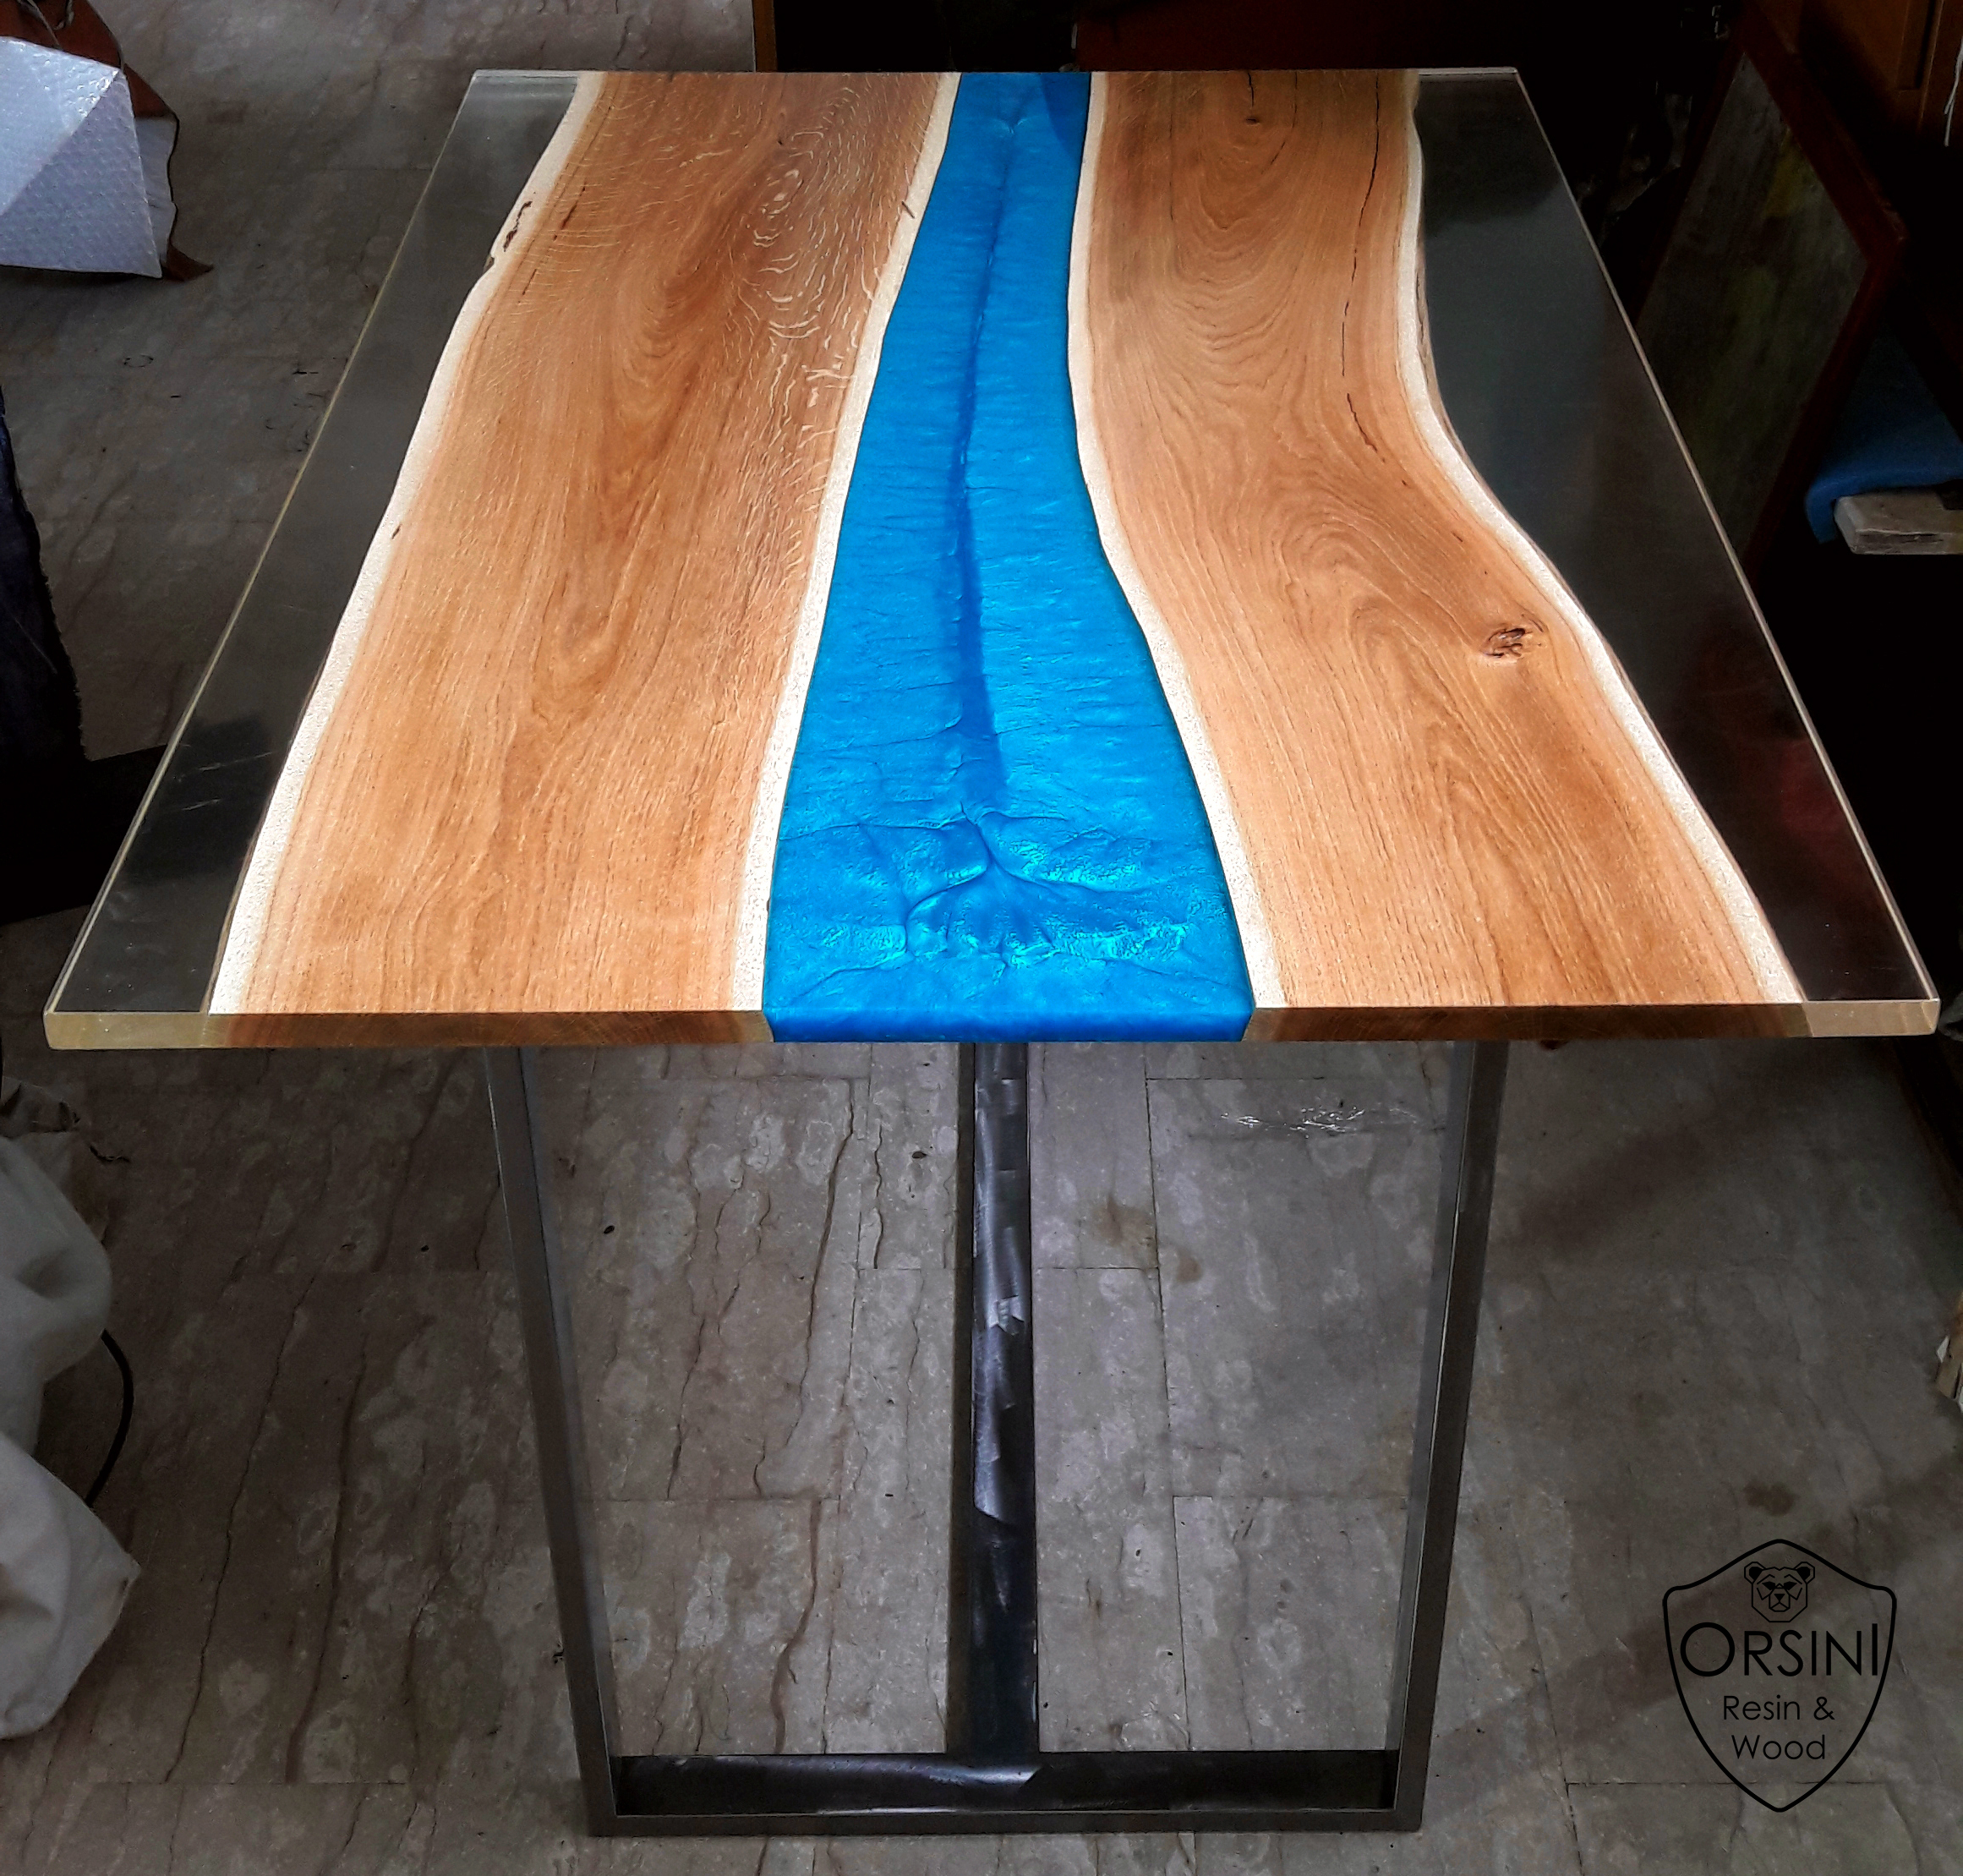 Lavori Orsini Resin Wood Tavoli E Arredamento Legno E Resina